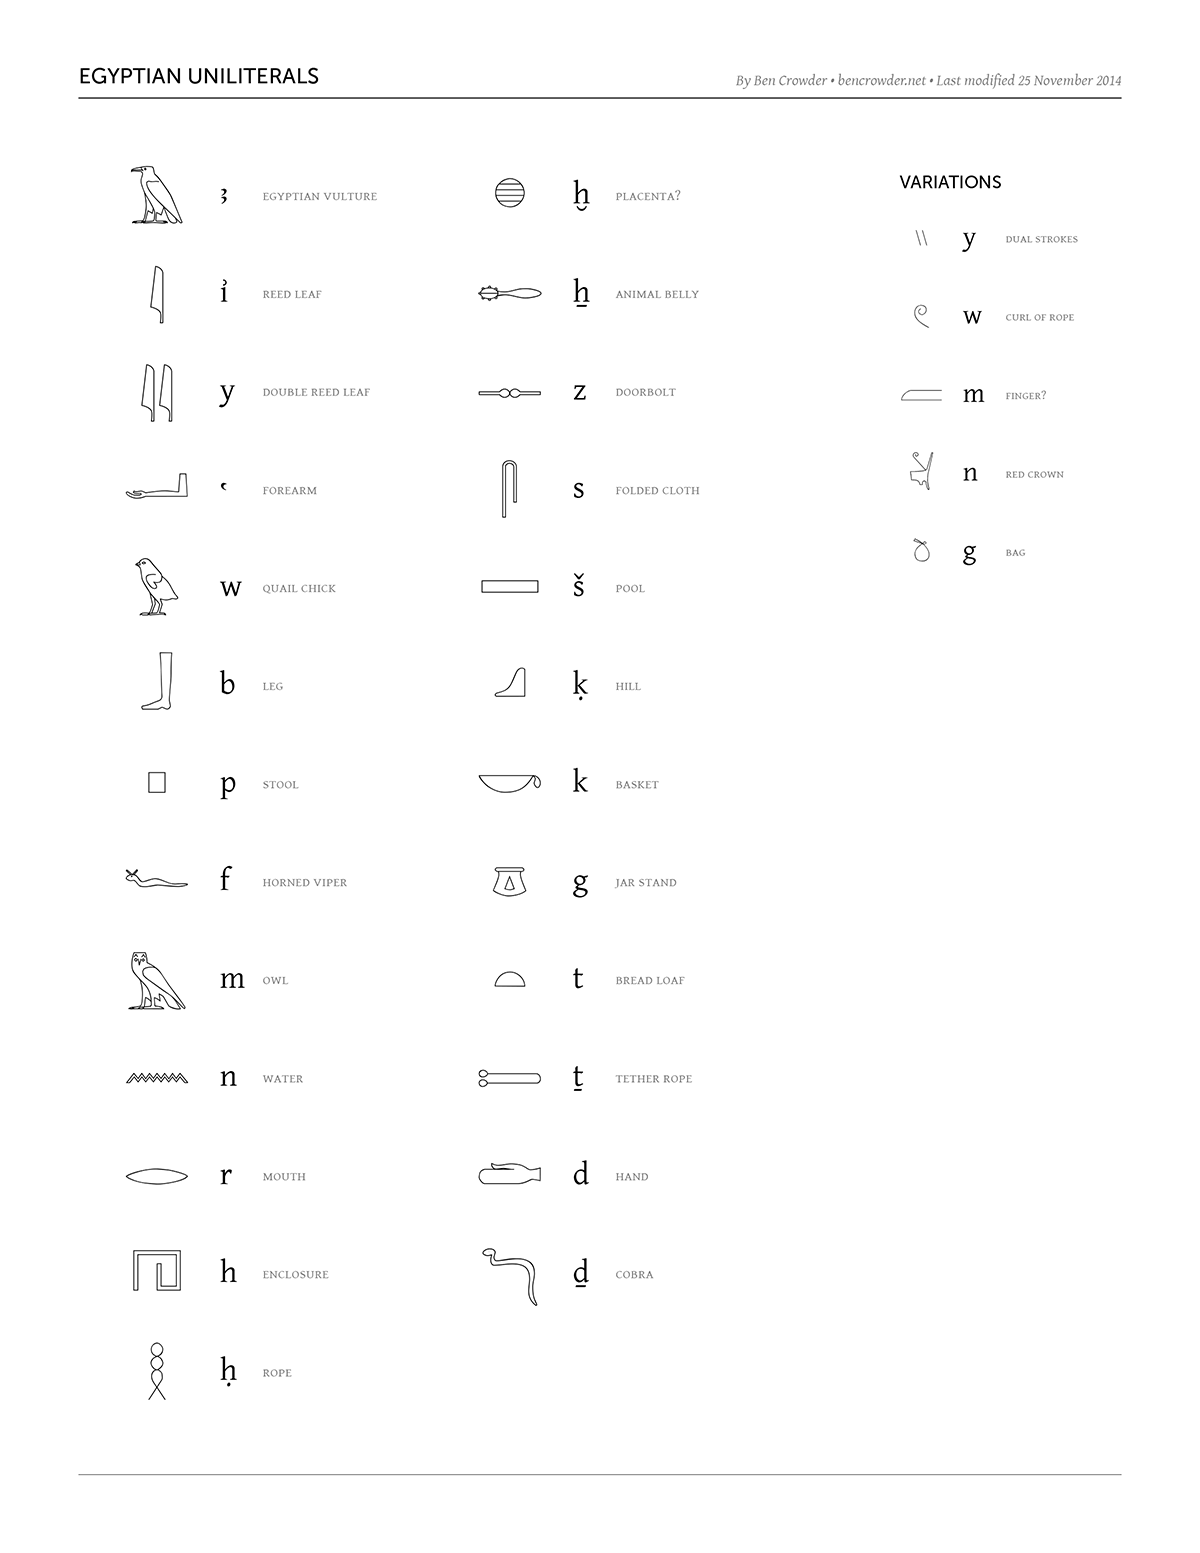 Egyptian Uniliterals Chart